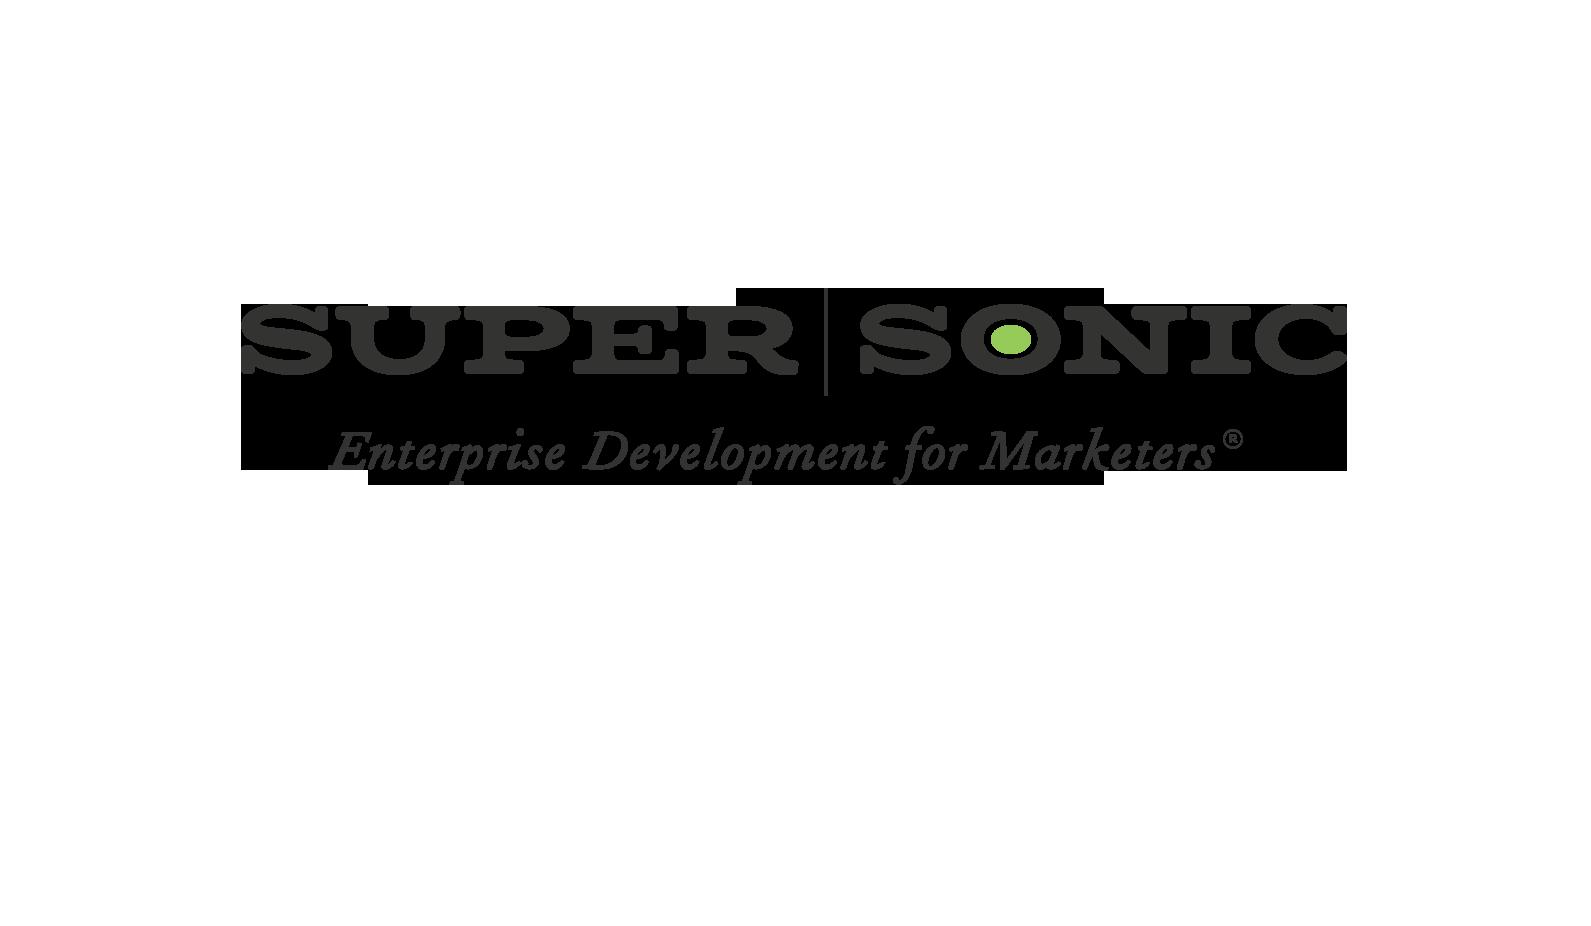 Supersonic Branding and Logo Design Minneapolis, Minnesota